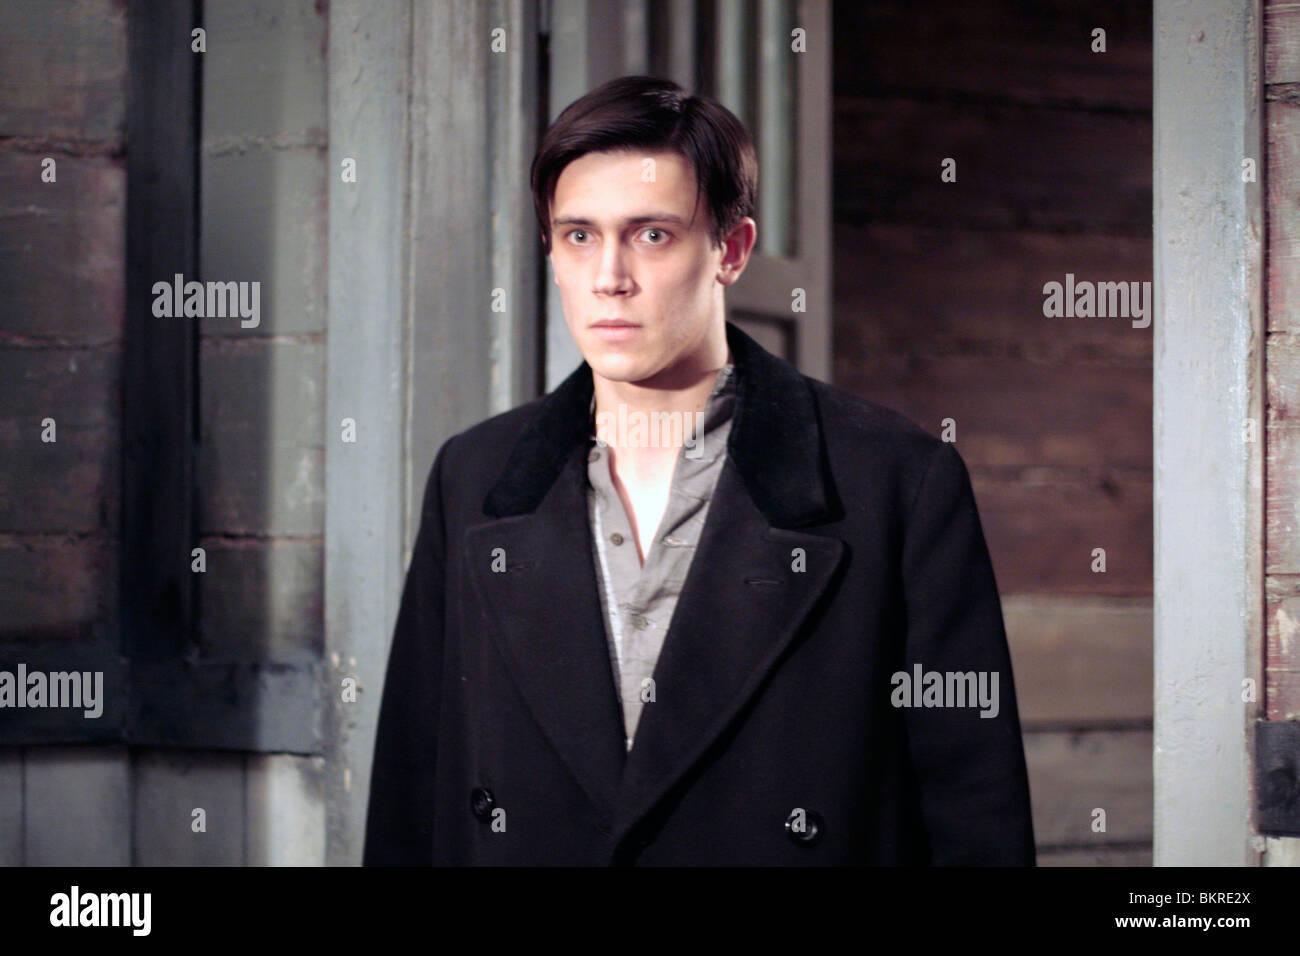 MORFIY -2008 ALEKSEY BALABANOV (DIR) - Stock Image